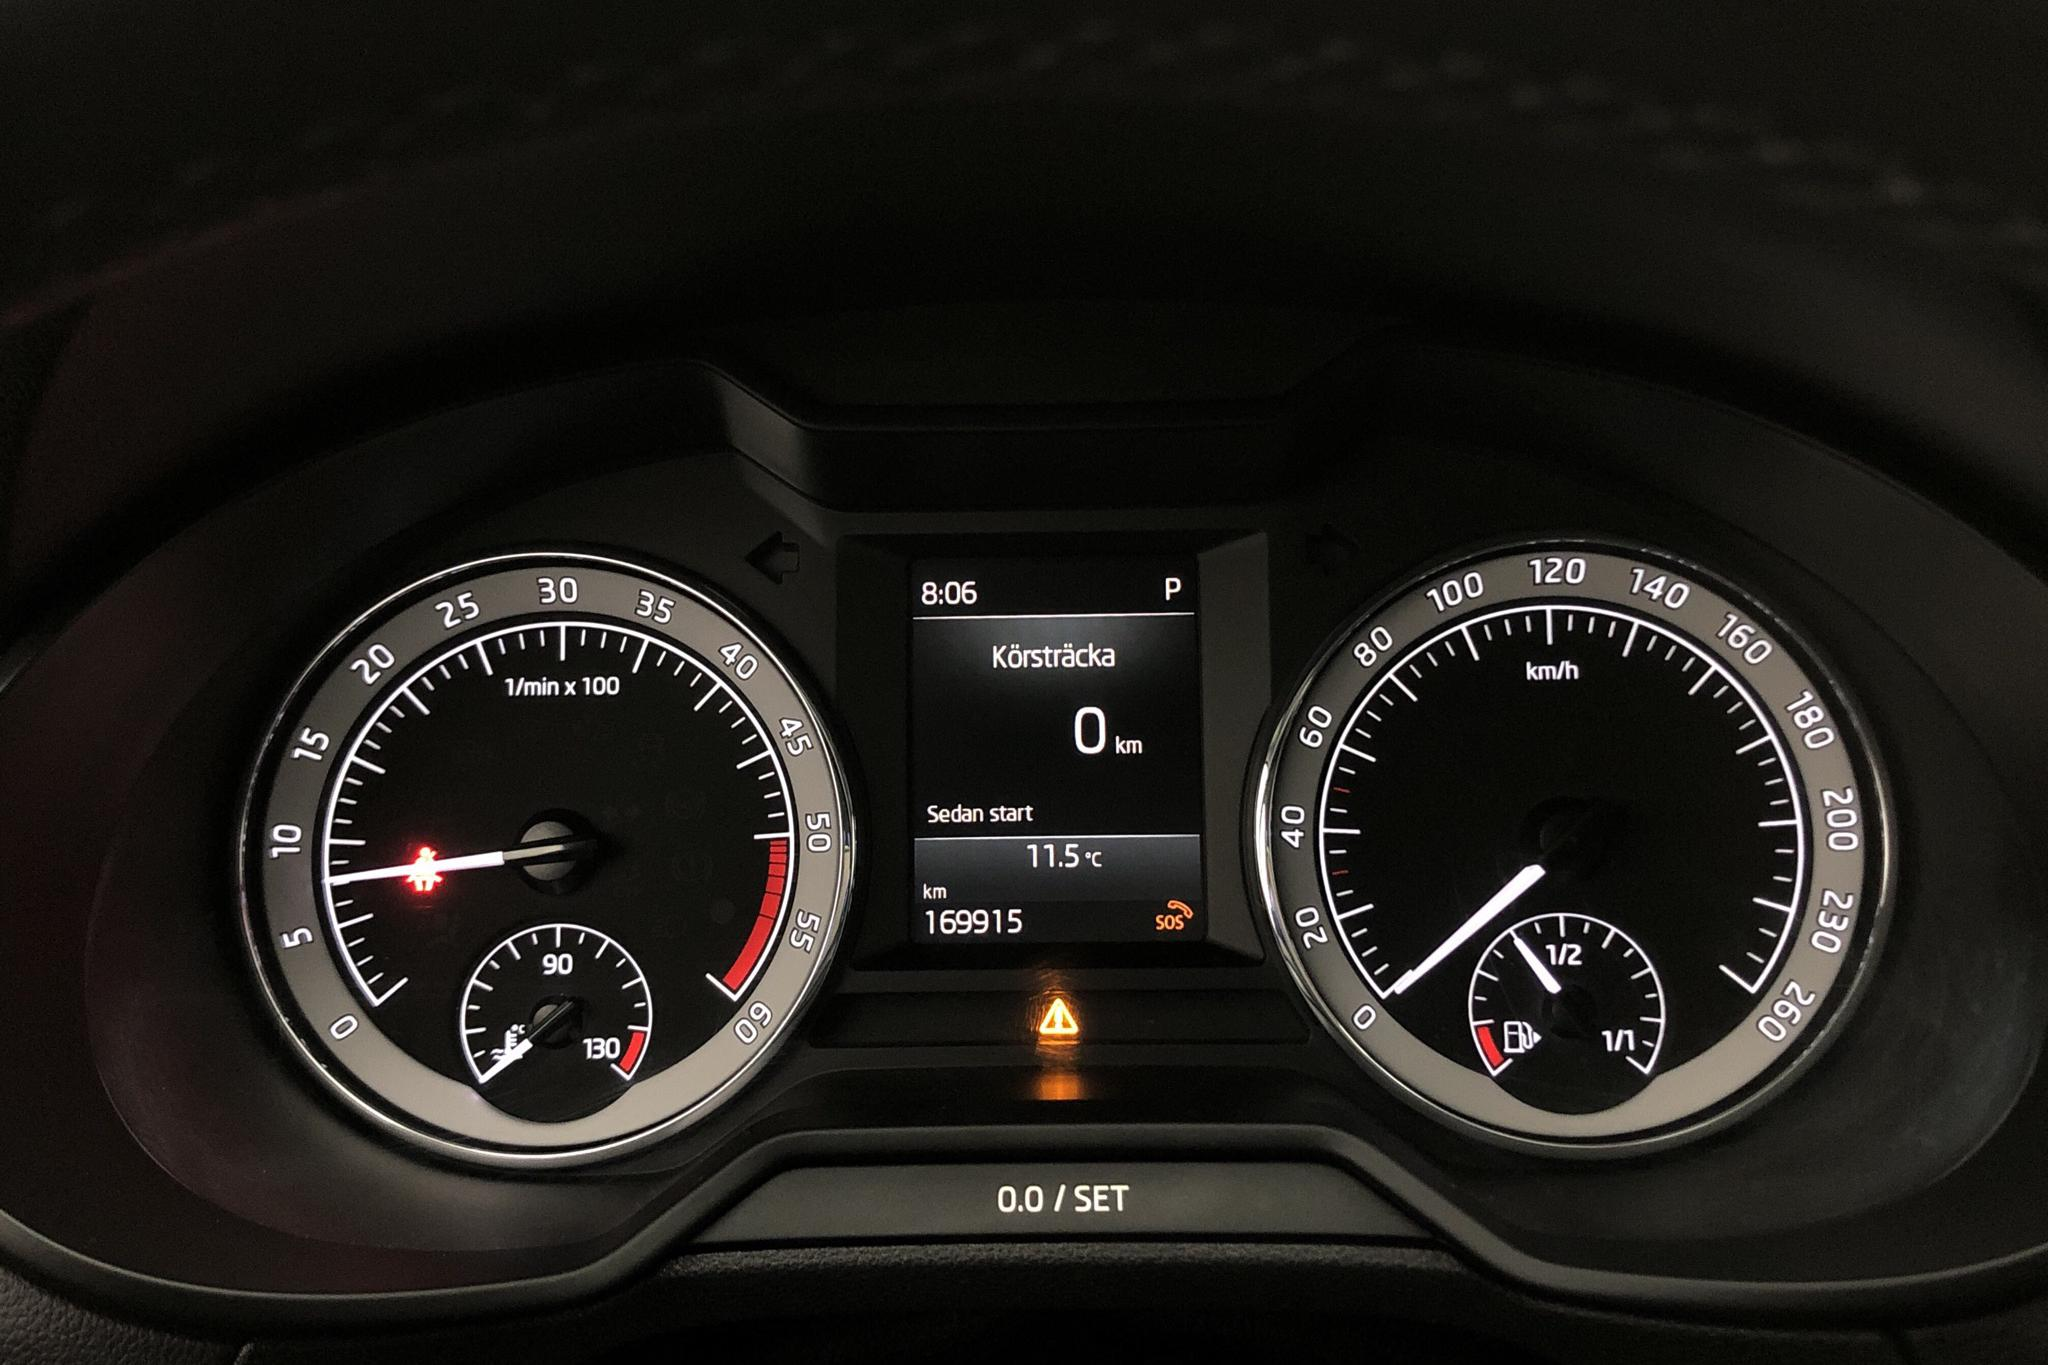 Skoda Octavia III 2.0 TDI CR Combi (150hk) - 169 910 km - Automatic - red - 2018